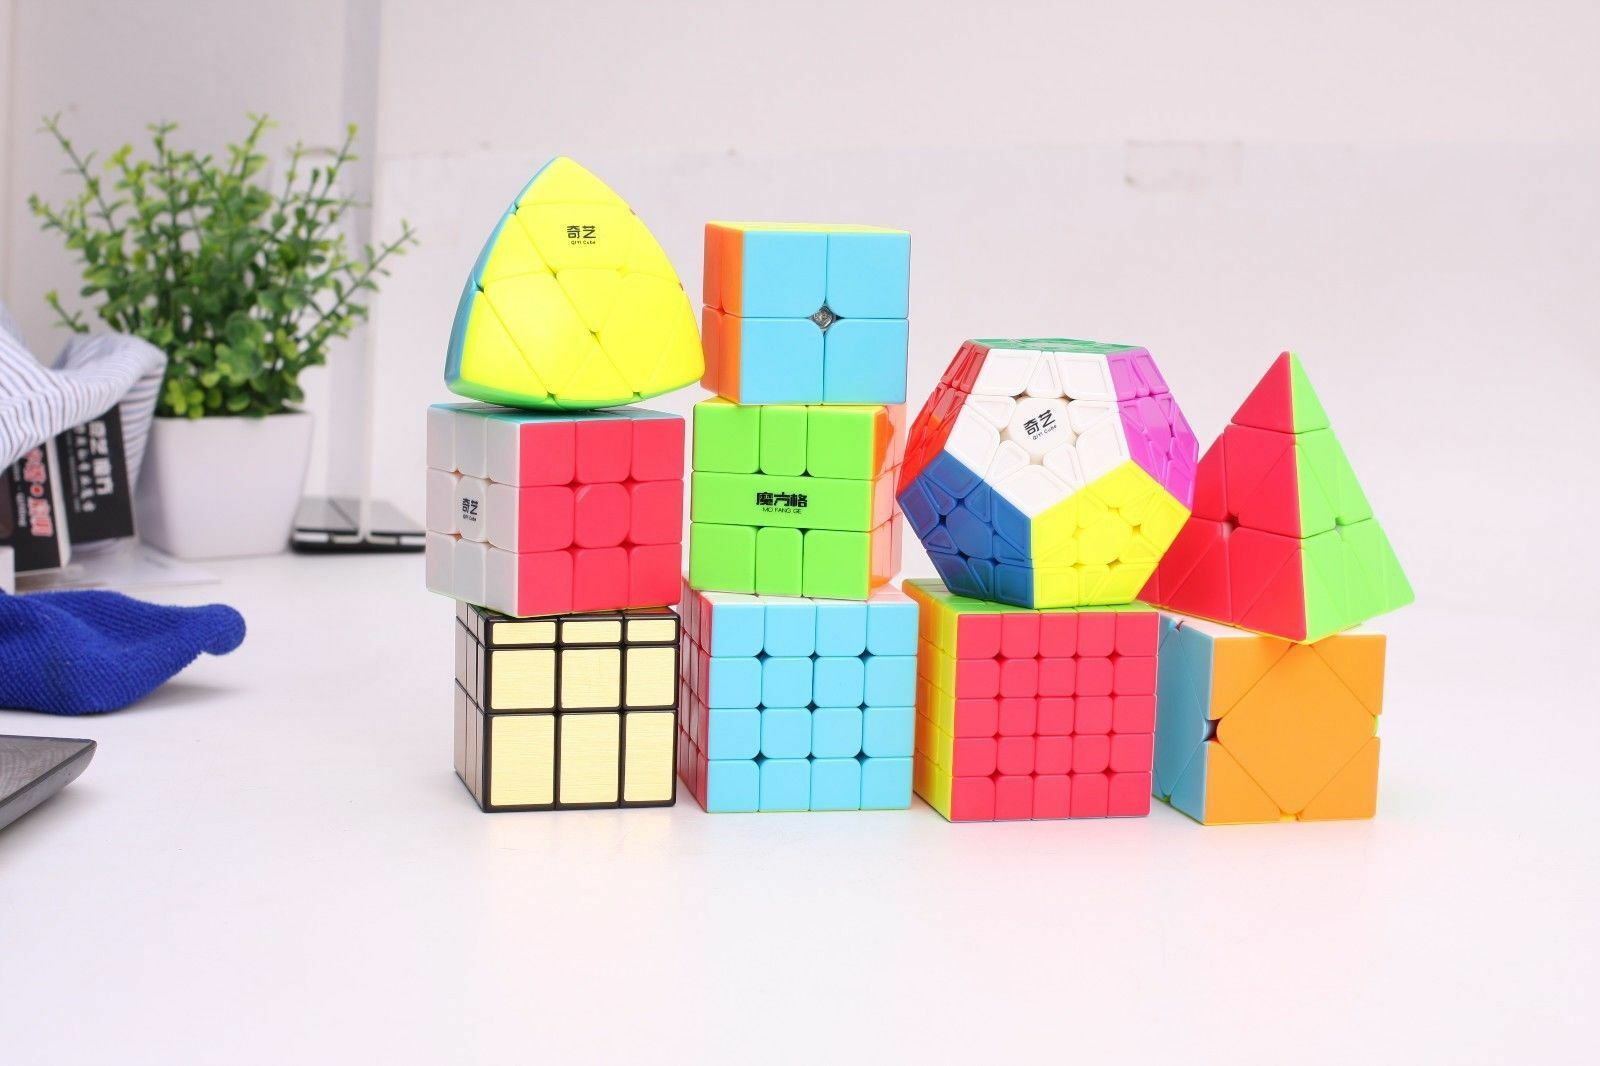 10 pc zauberwrfel set 2x2 3x3x3 4x4x4 5x5x5 pyramide megaminx skewb mirror cube